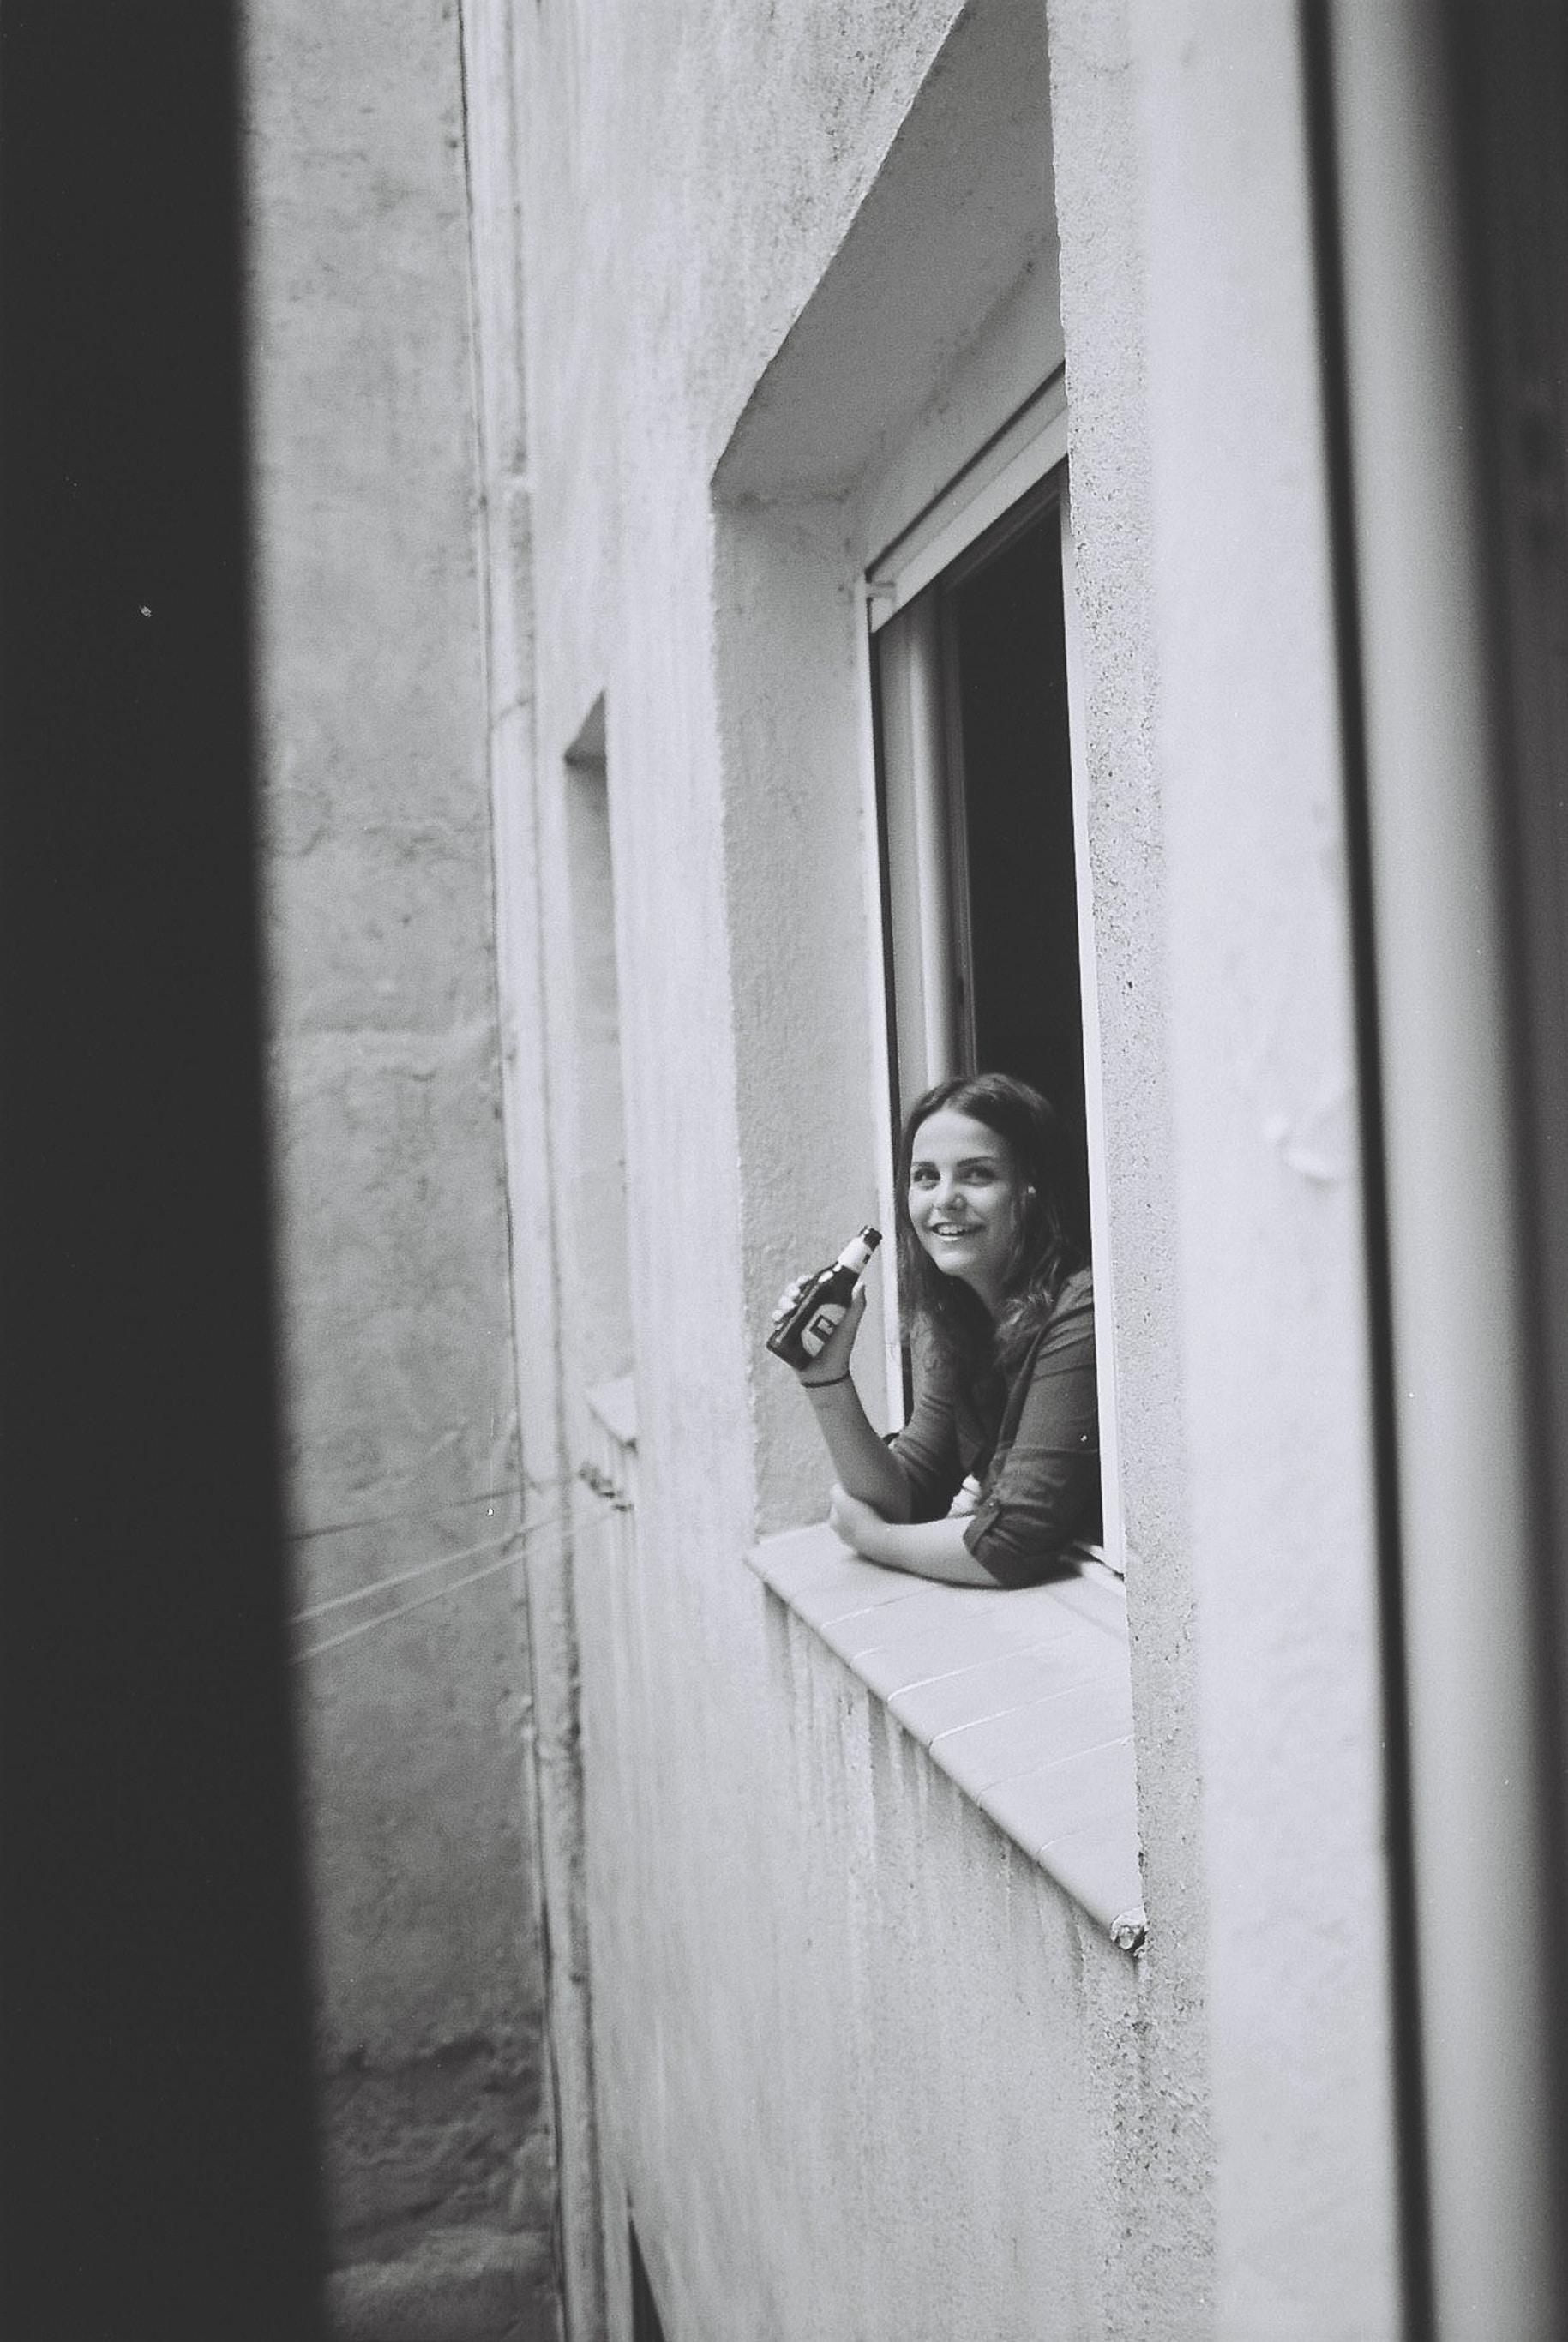 woman holding beer bottle on window